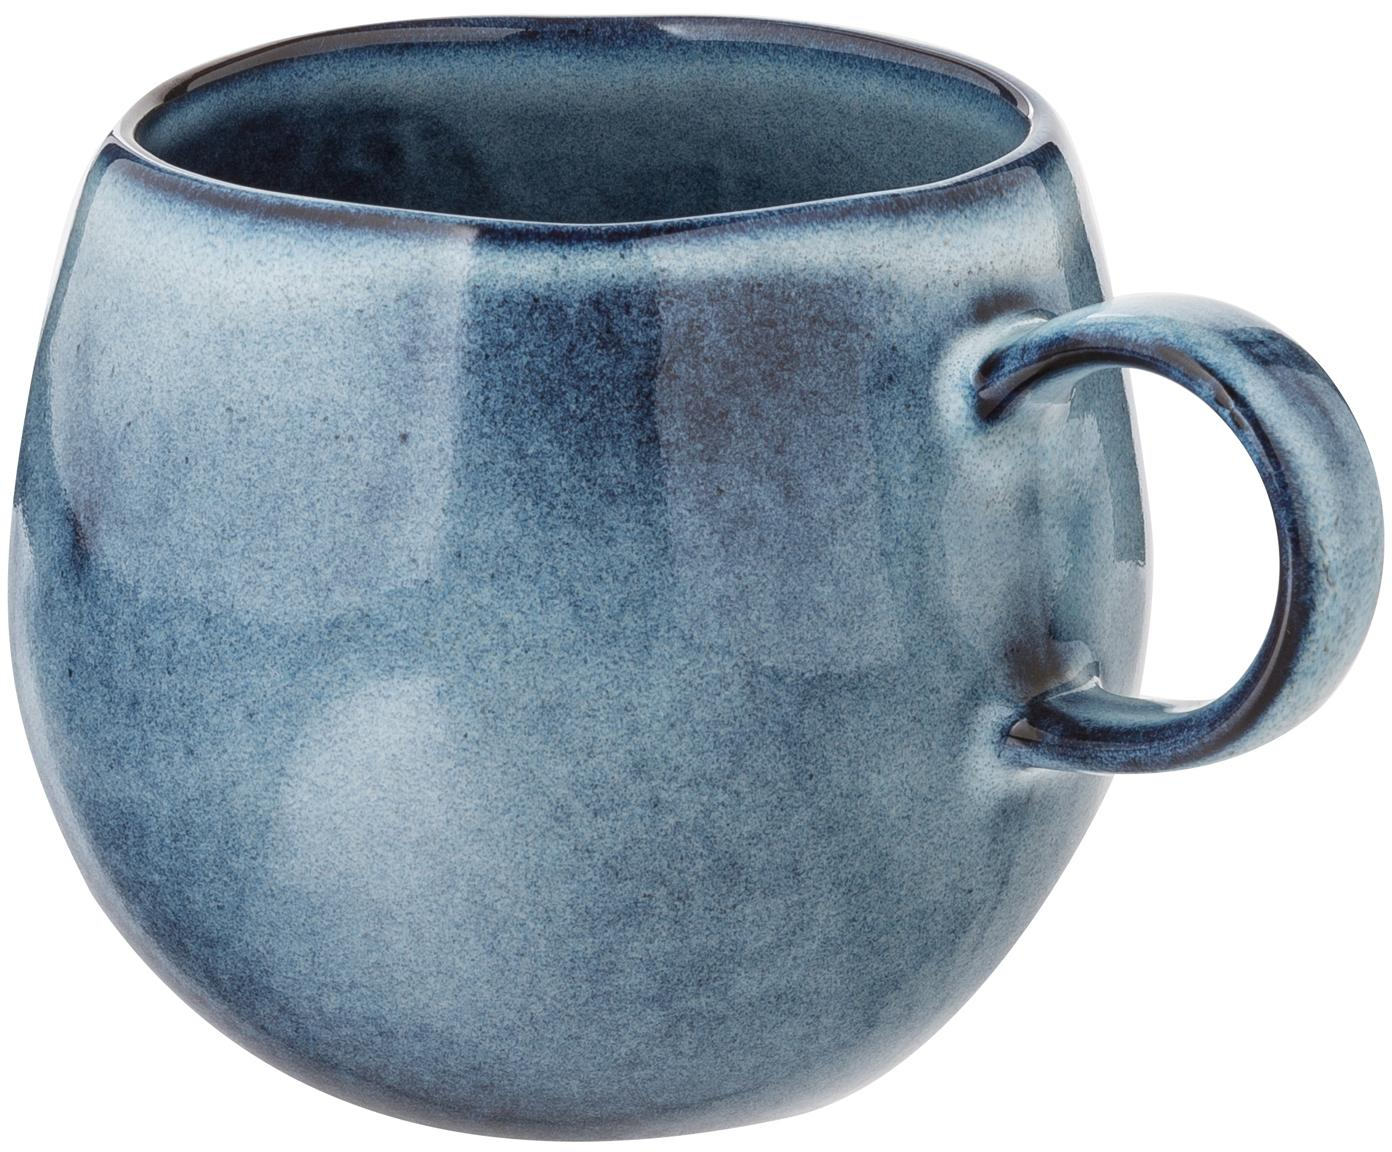 Handgemachte Tasse Sandrine, Keramik, Blau, Ø 10 x H 10 cm